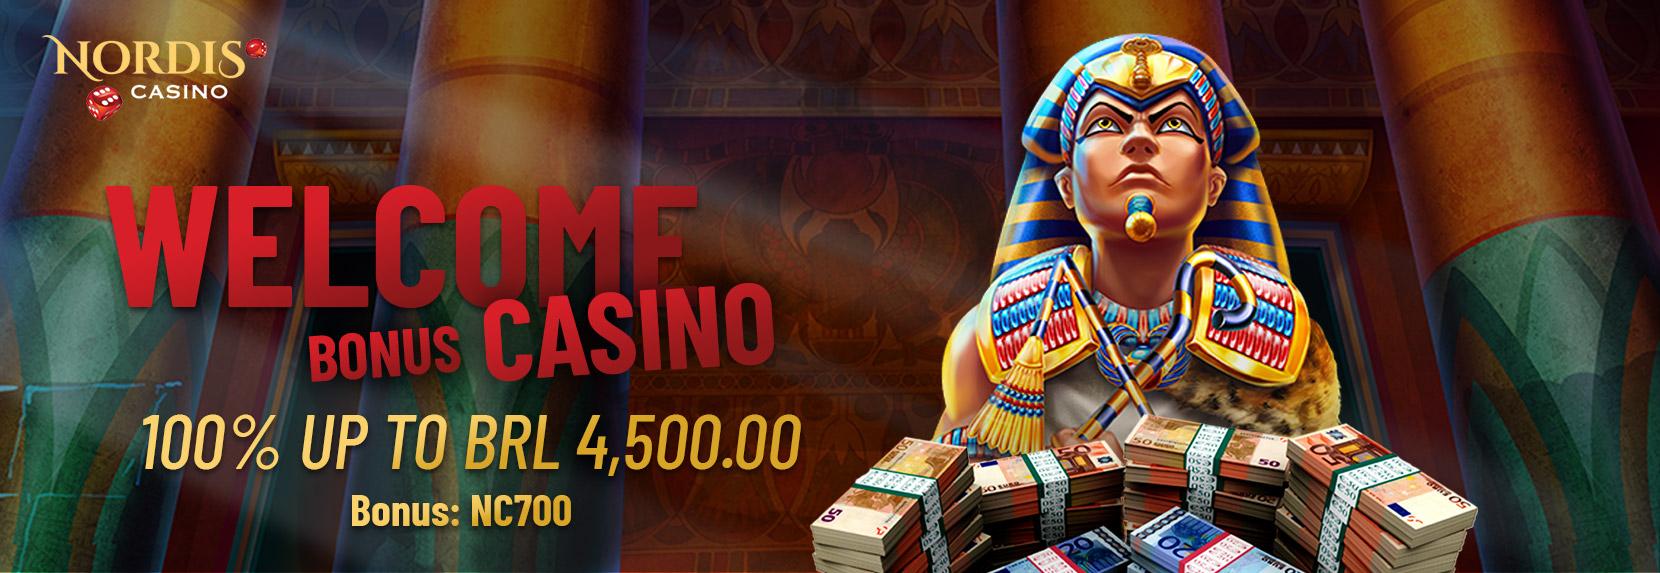 Welcome Bonus  Casino – BRL